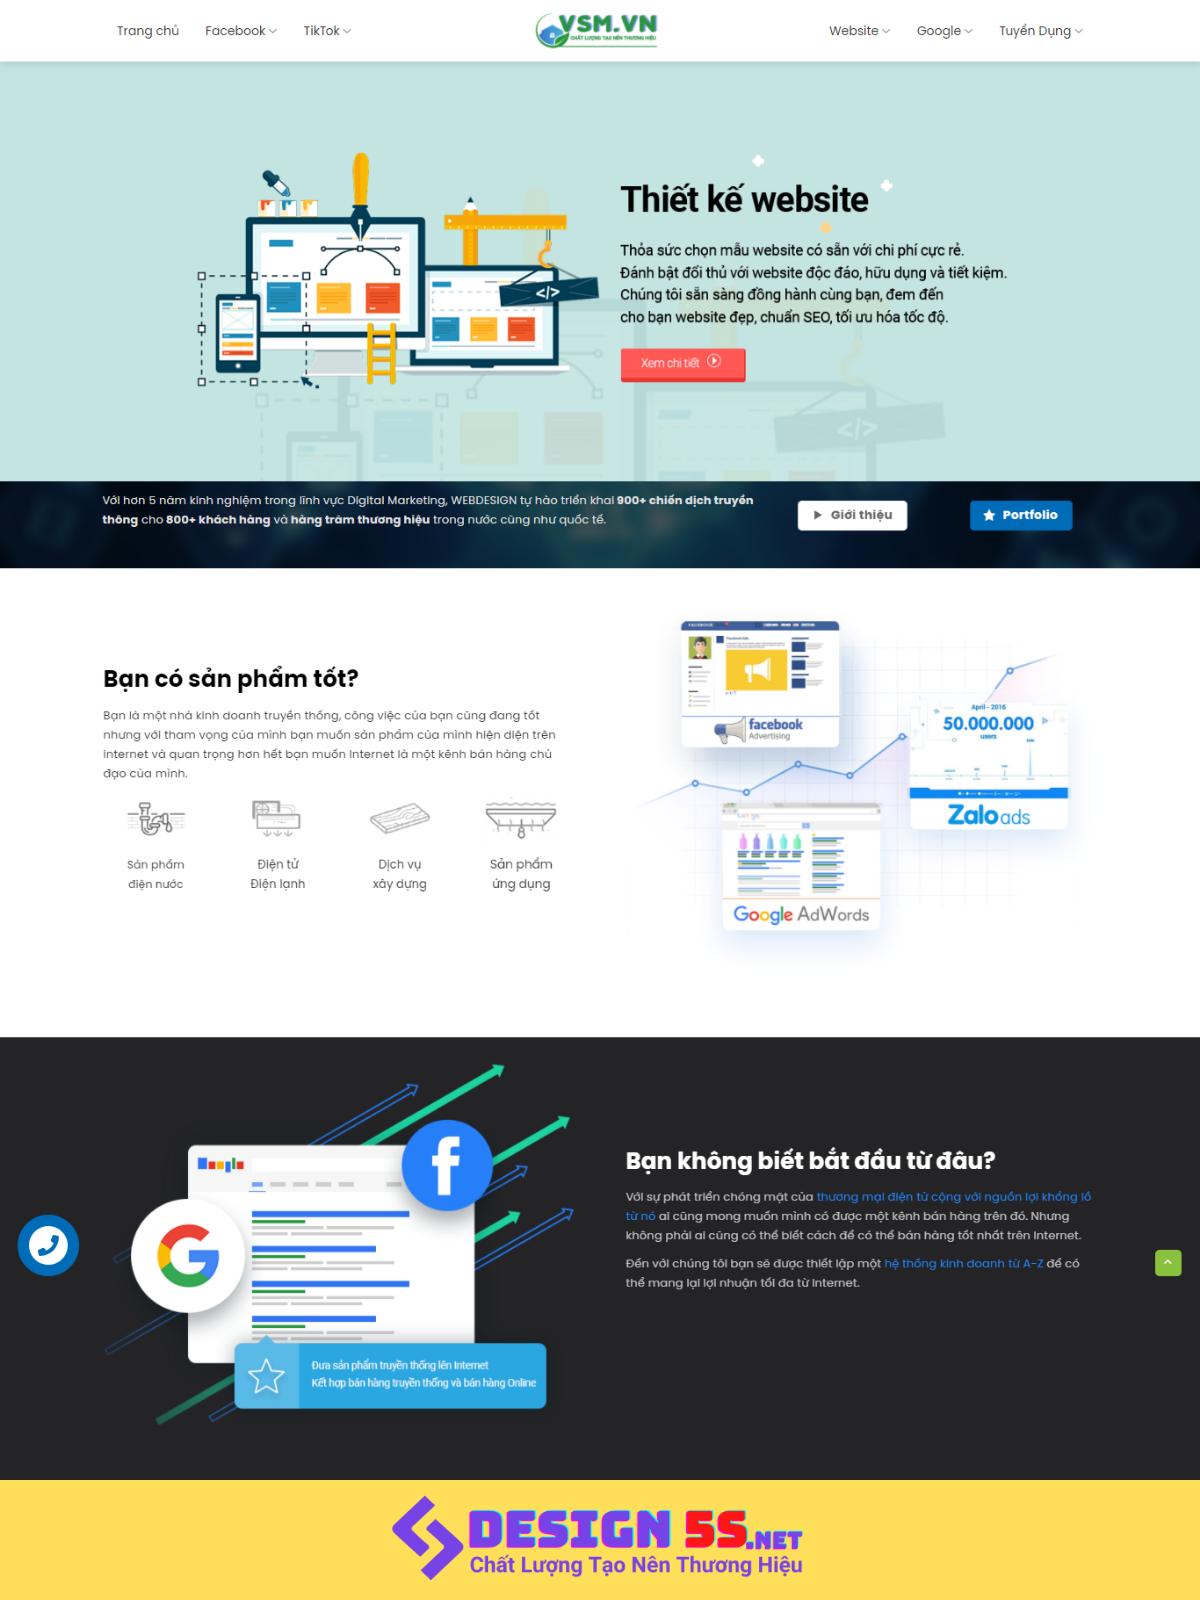 Template blogspot thiết kế web kết hợp marketing VSM67